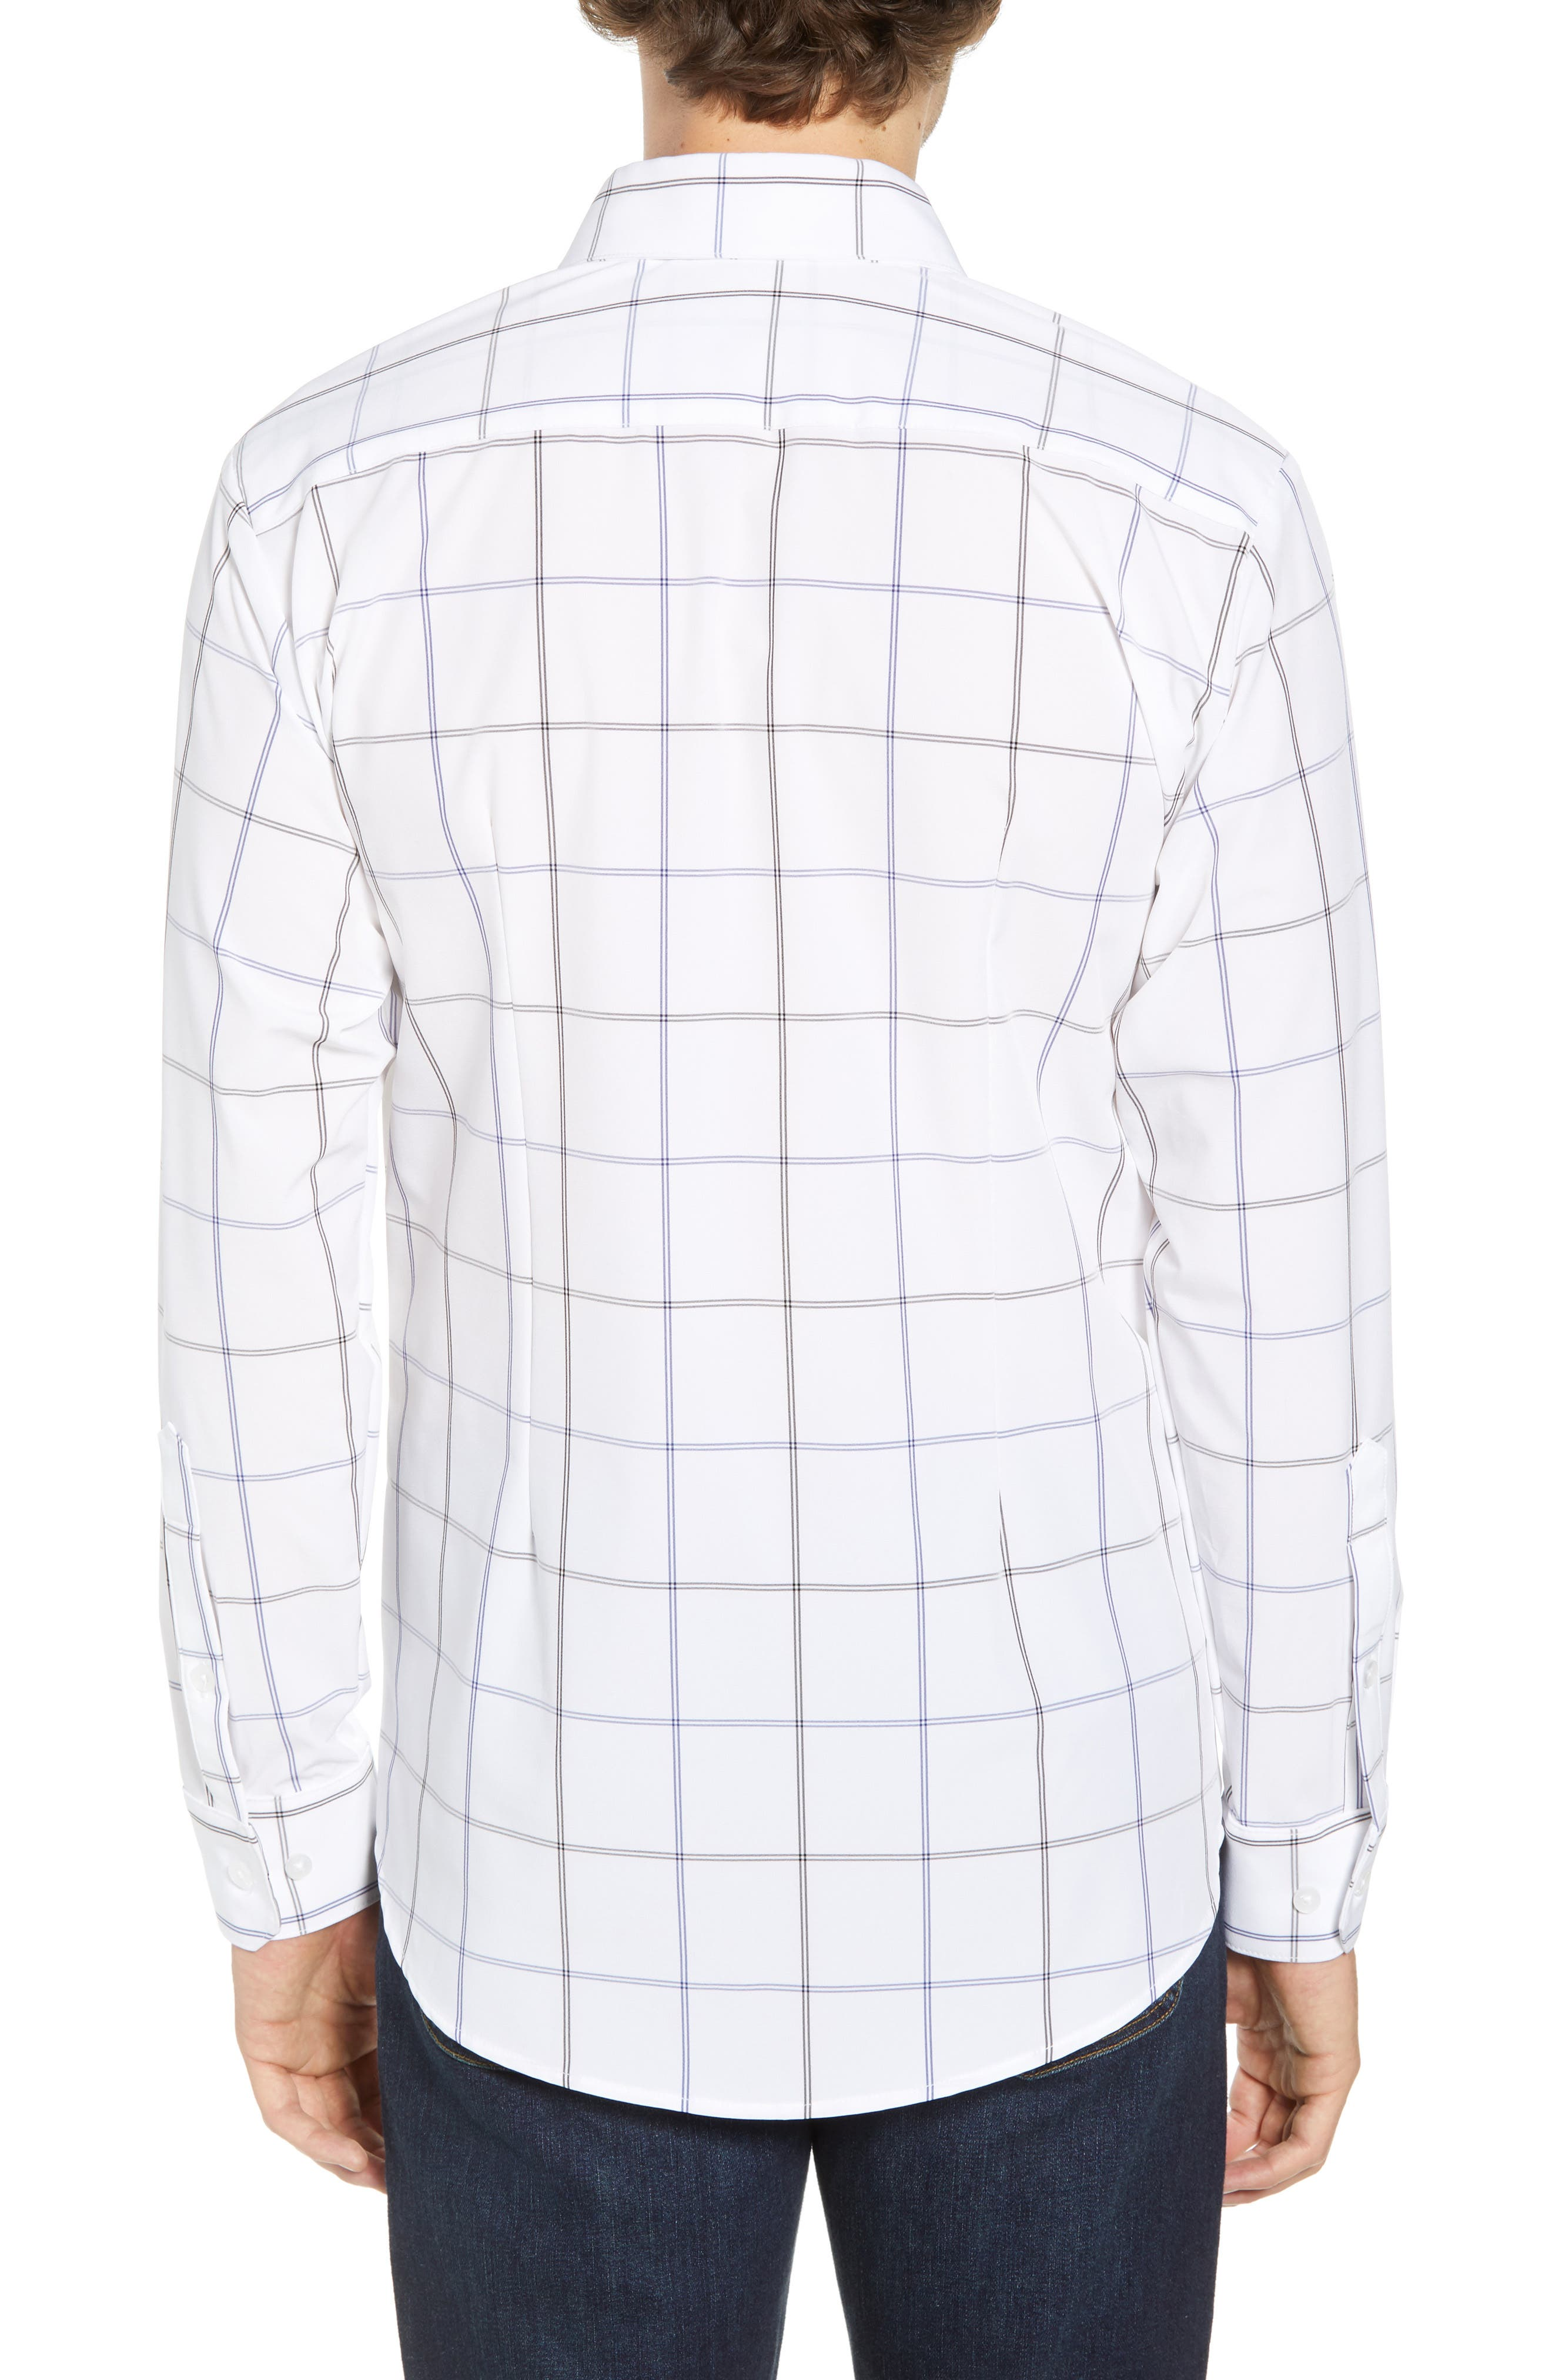 Crossman Slim Fit Grid Performance Sport Shirt,                             Alternate thumbnail 2, color,                             WHITE